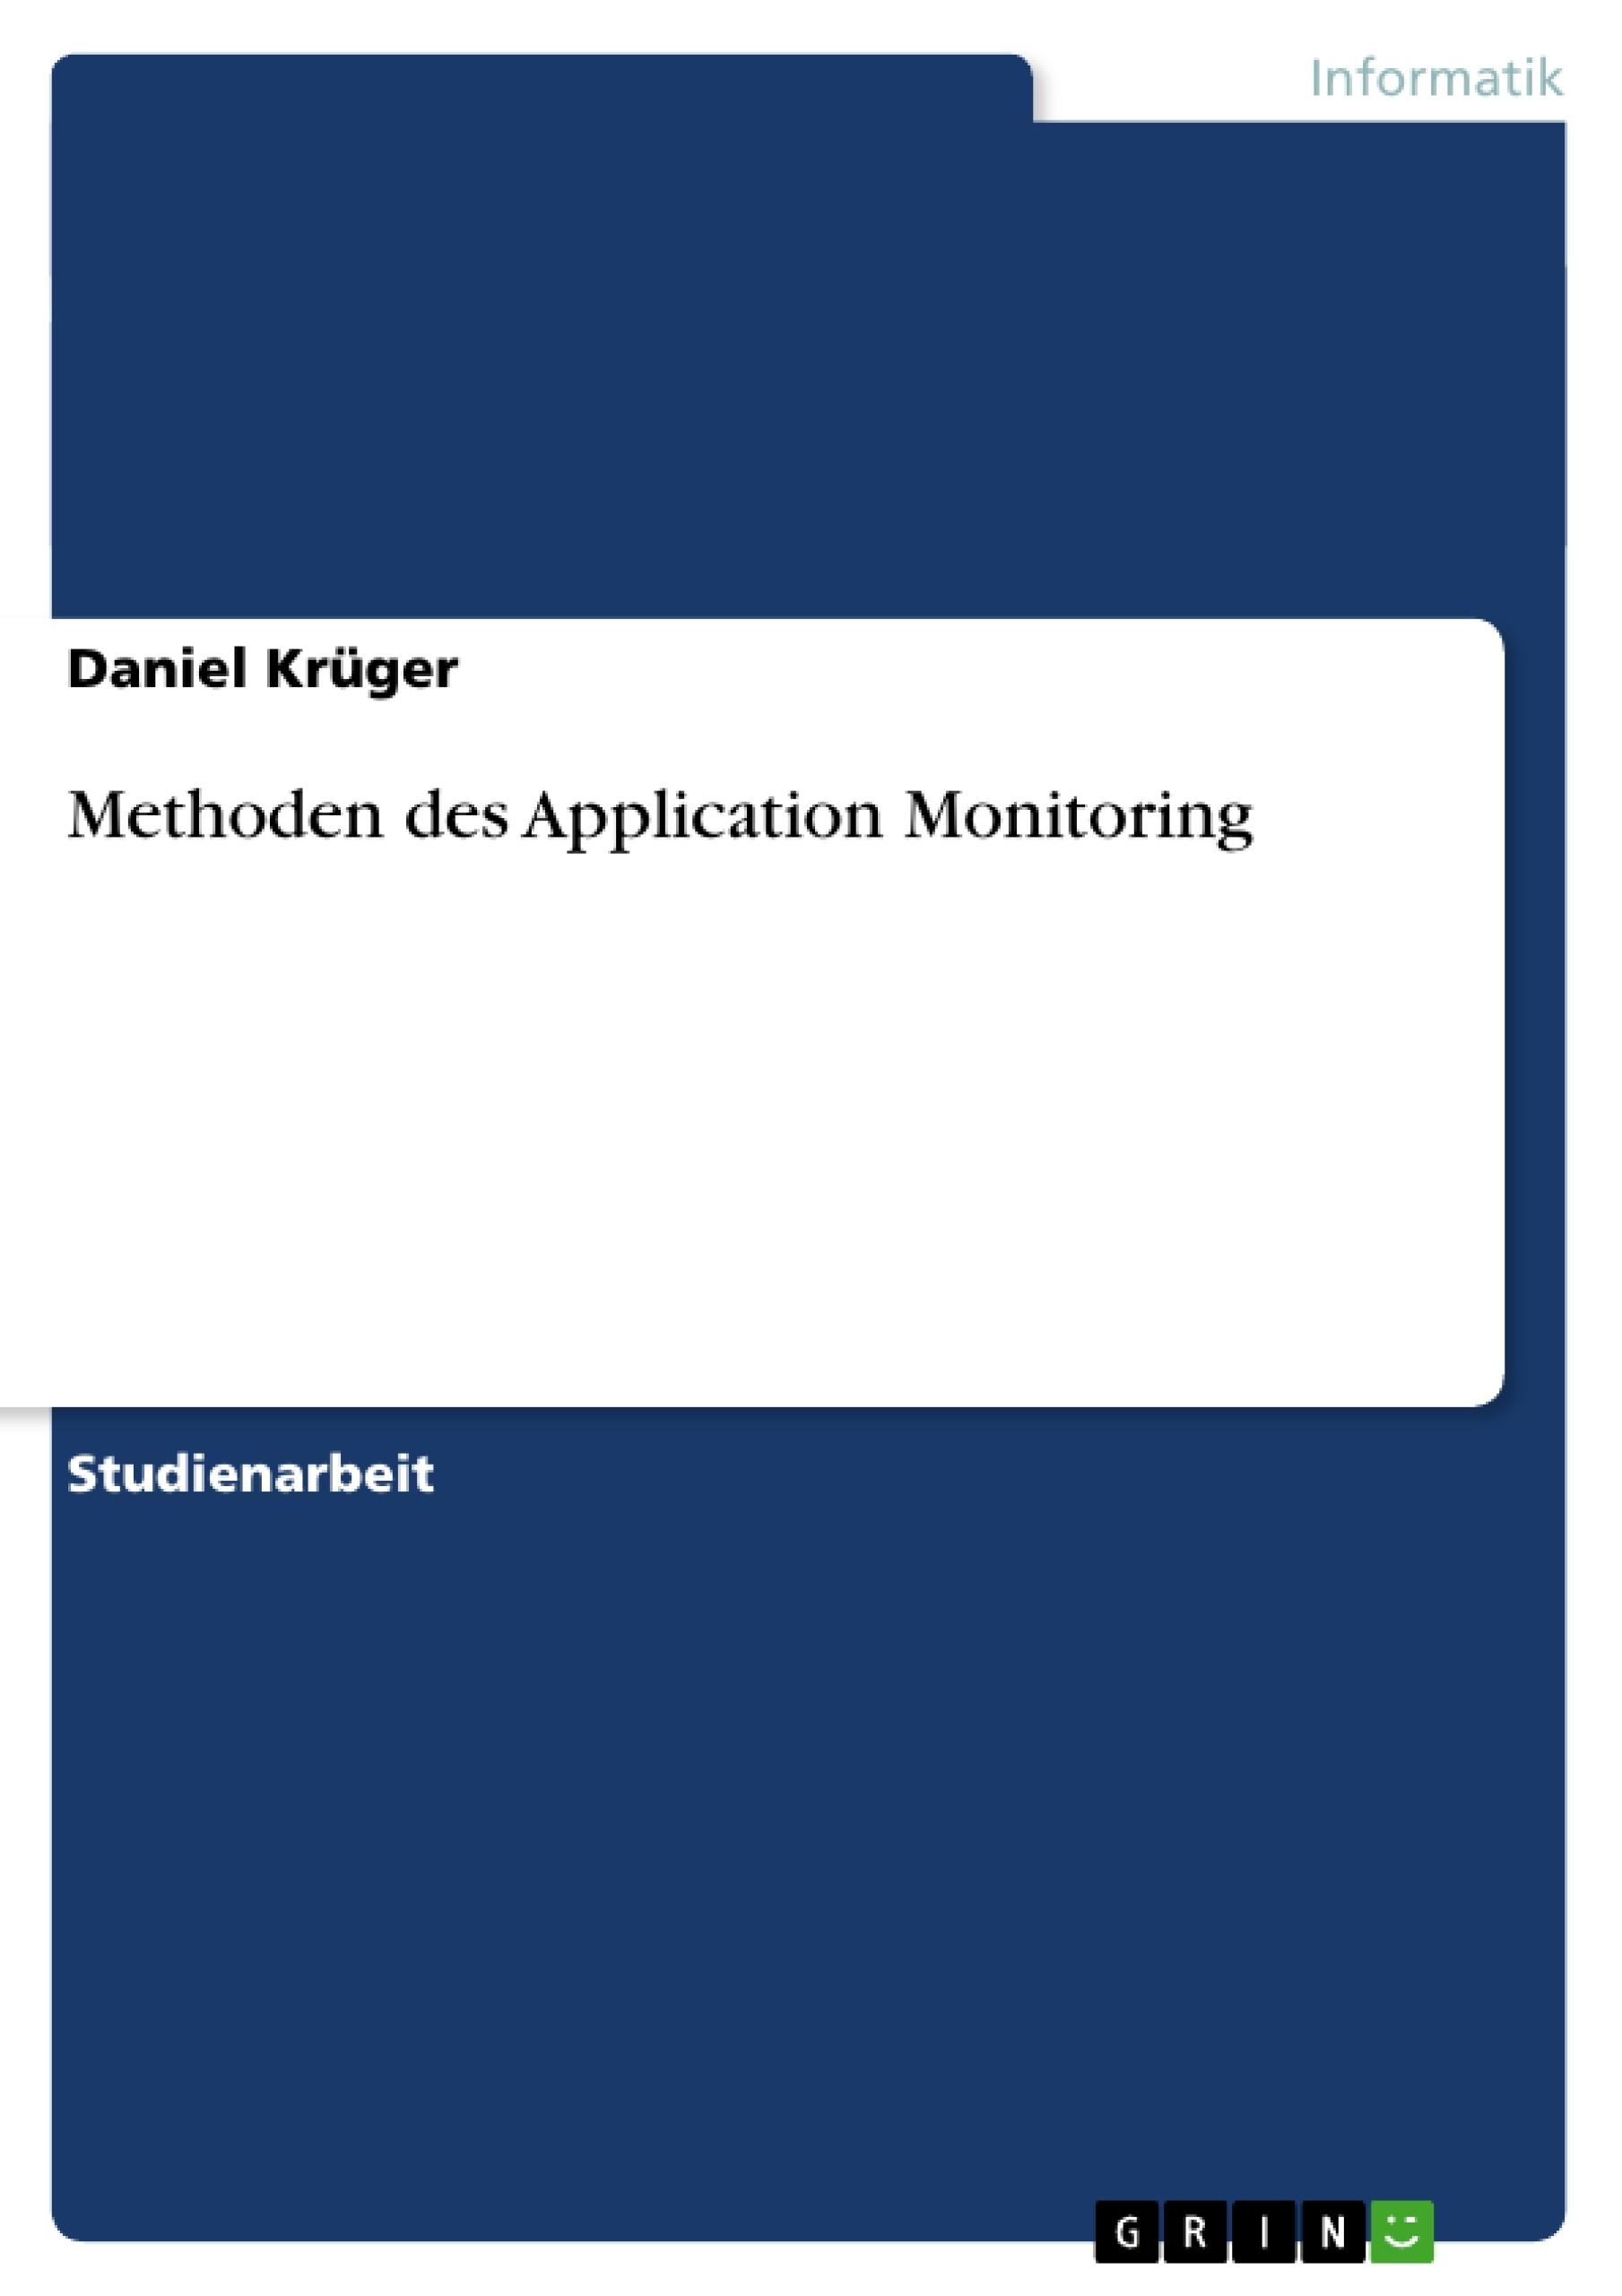 Titel: Methoden des Application Monitoring